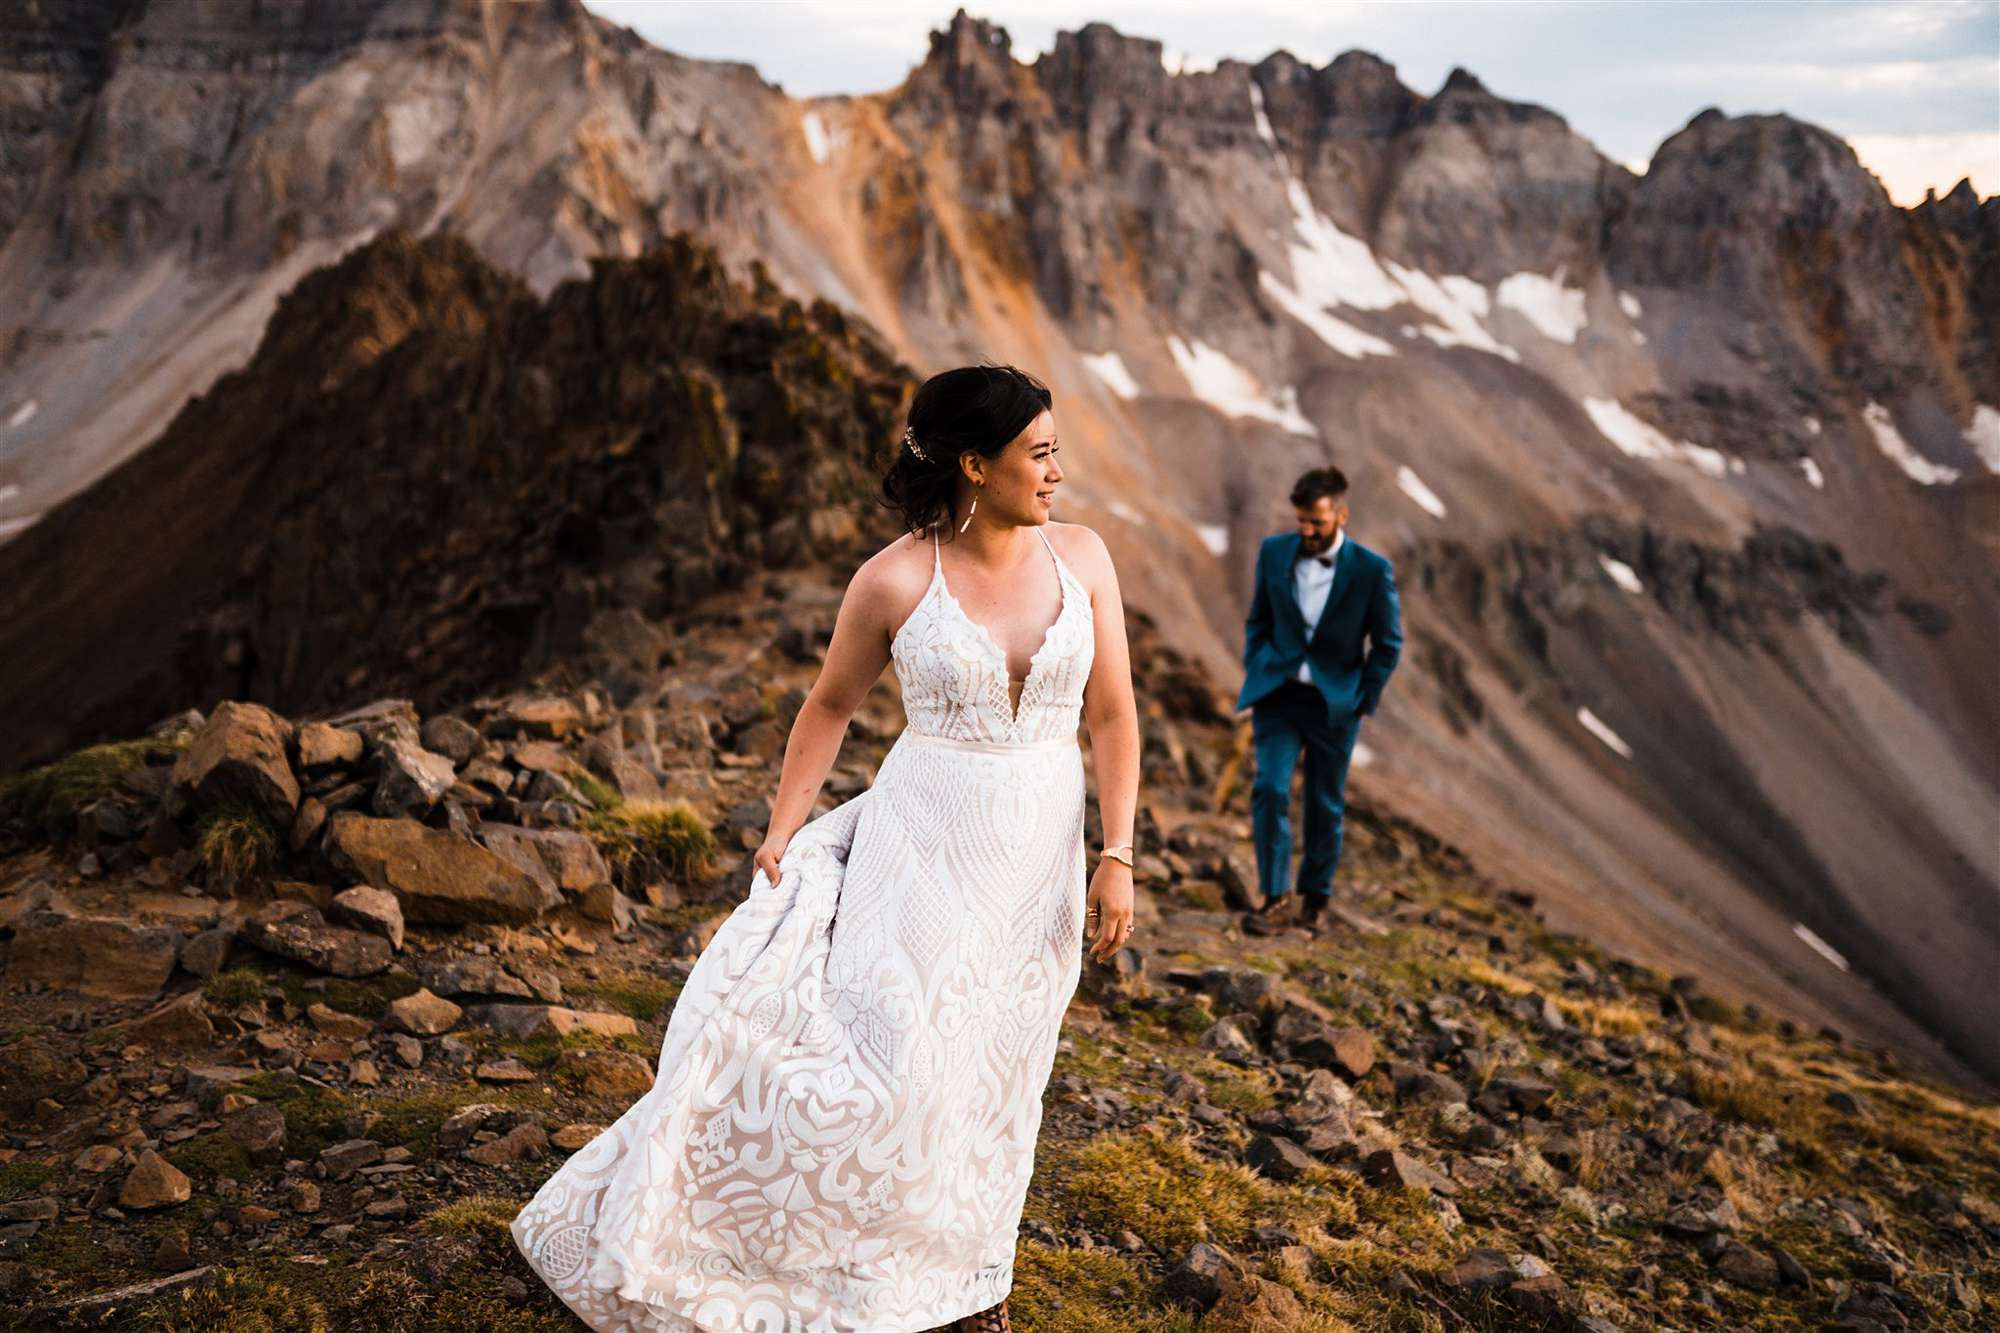 Colorado_Jeeping_Elopement_Emily_Matt_The_Foxes_Photography_0051.jpg